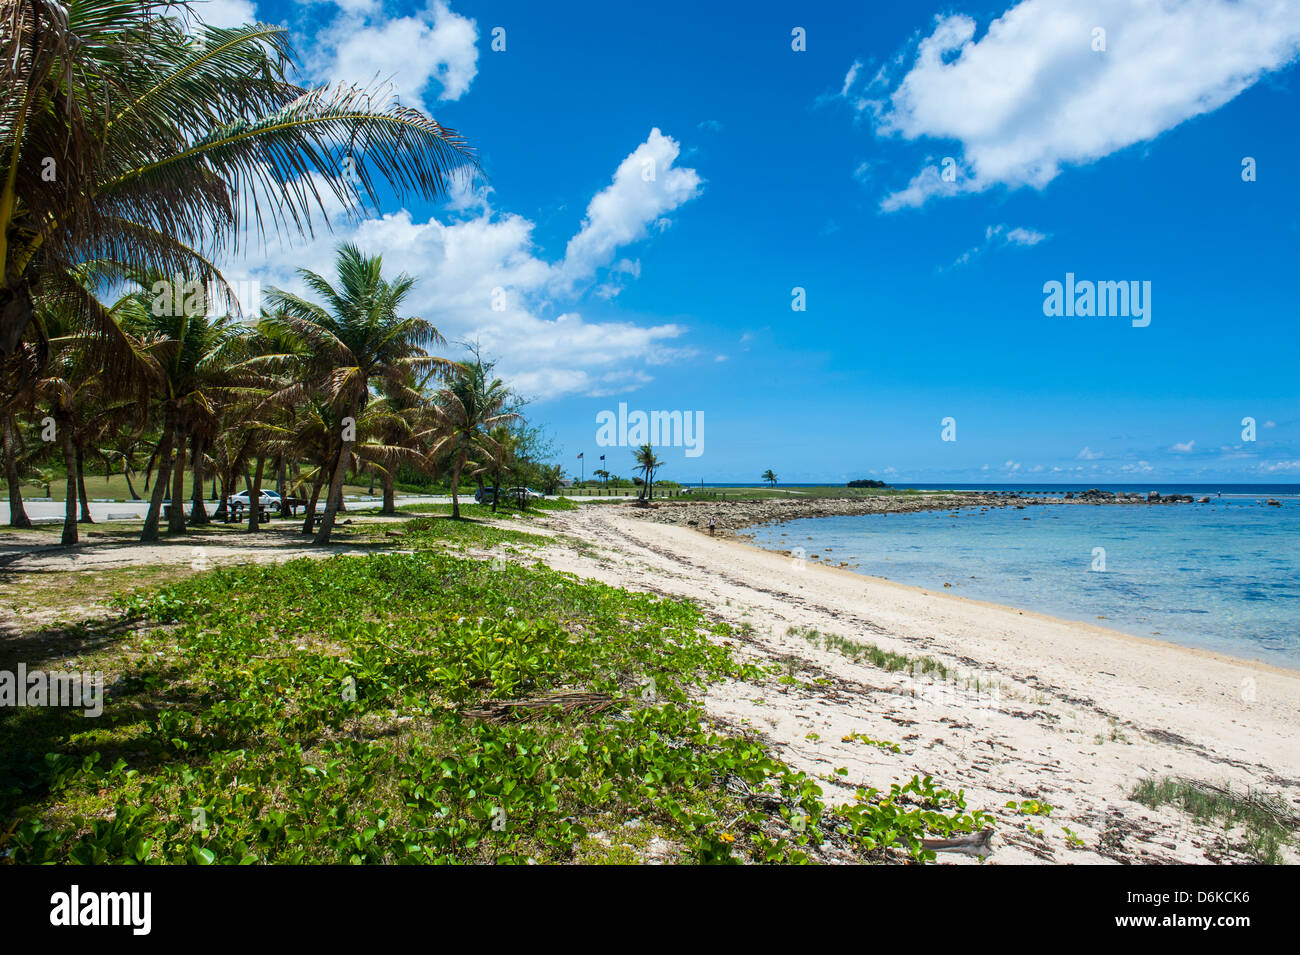 Sandy Bay in der Pacific National Historical Park, Guam, US-Territorium, Central Pacific, Pazifik Stockbild